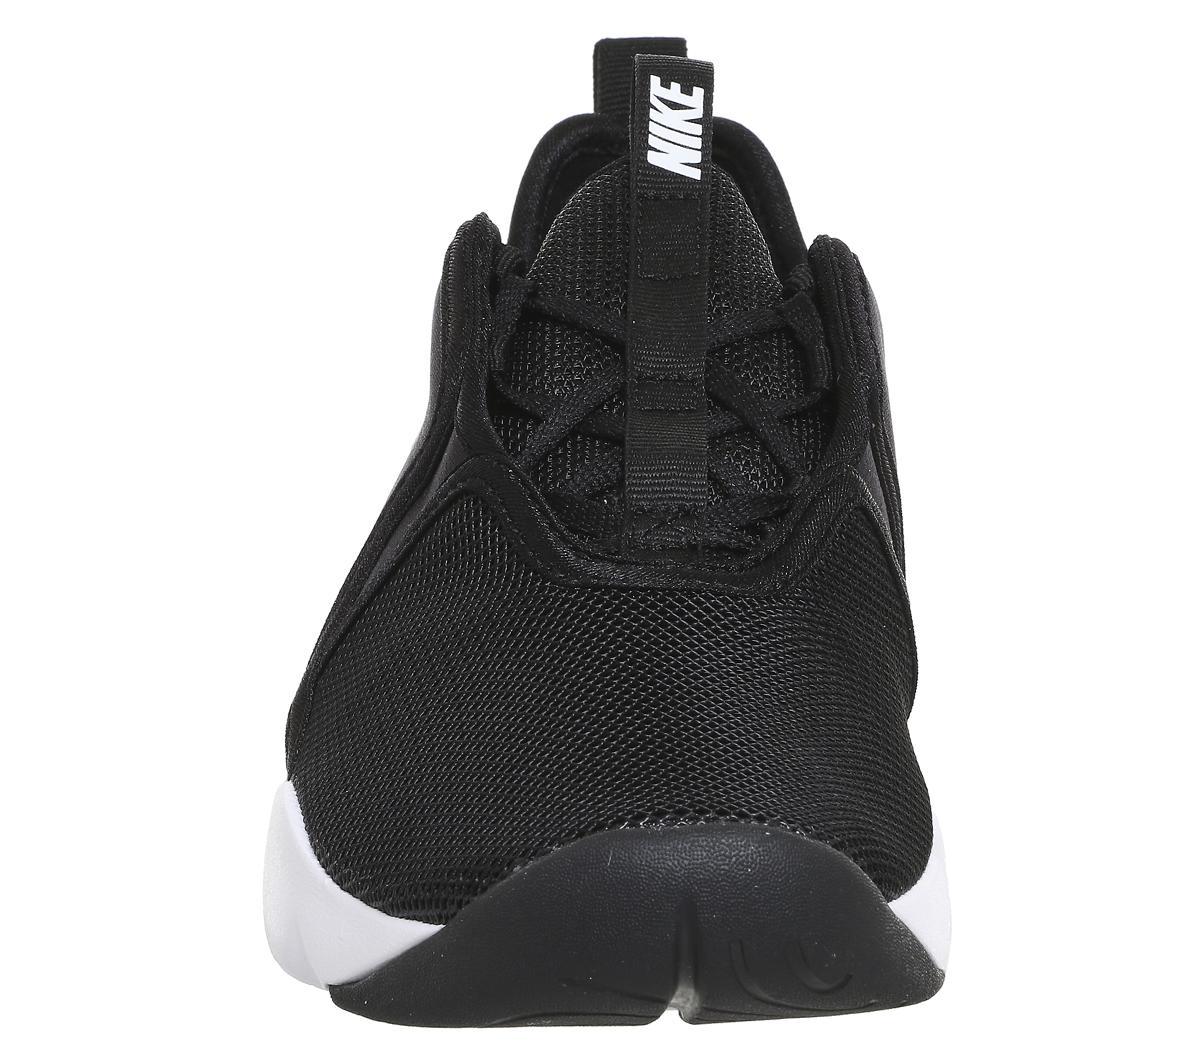 salario gasolina Ocho  Nike Nike Loden Black Wolf Grey White - Hers trainers